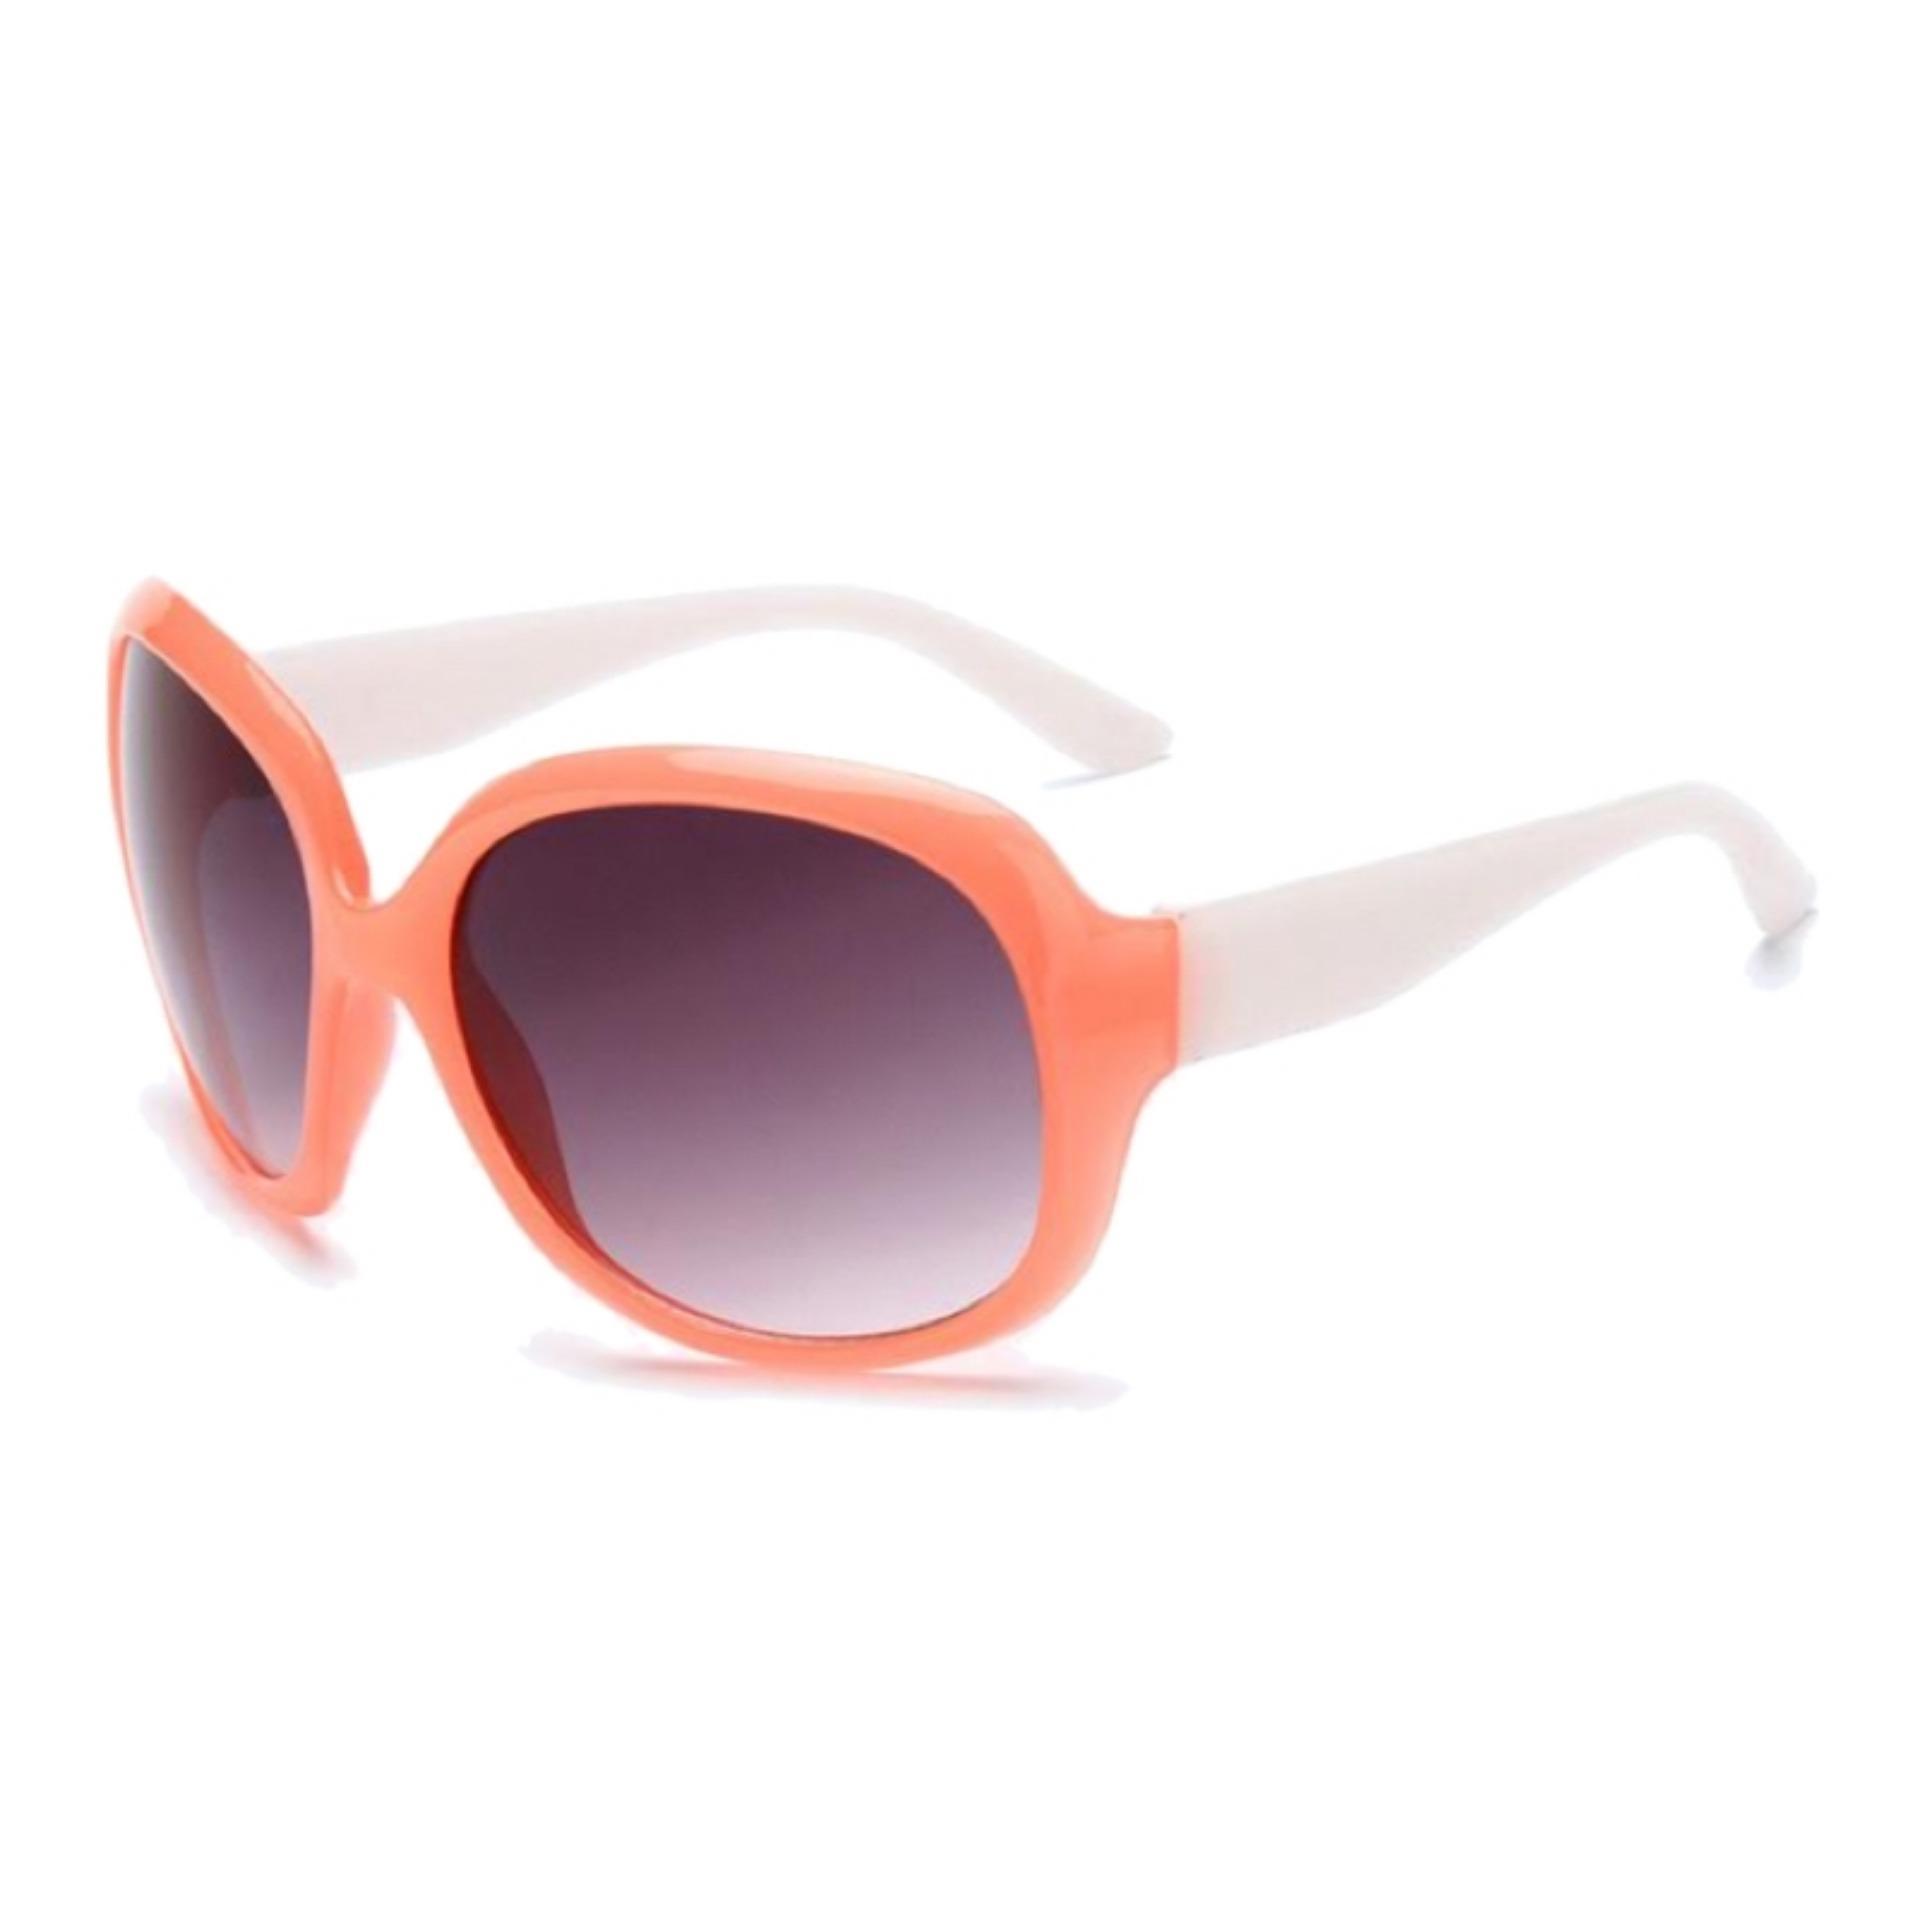 ... Fashion SunGlasses Style - Kacamata Wanita - Anti UV - Hitam - Clasic  Woman Glasses UV ... 53d26a7f53